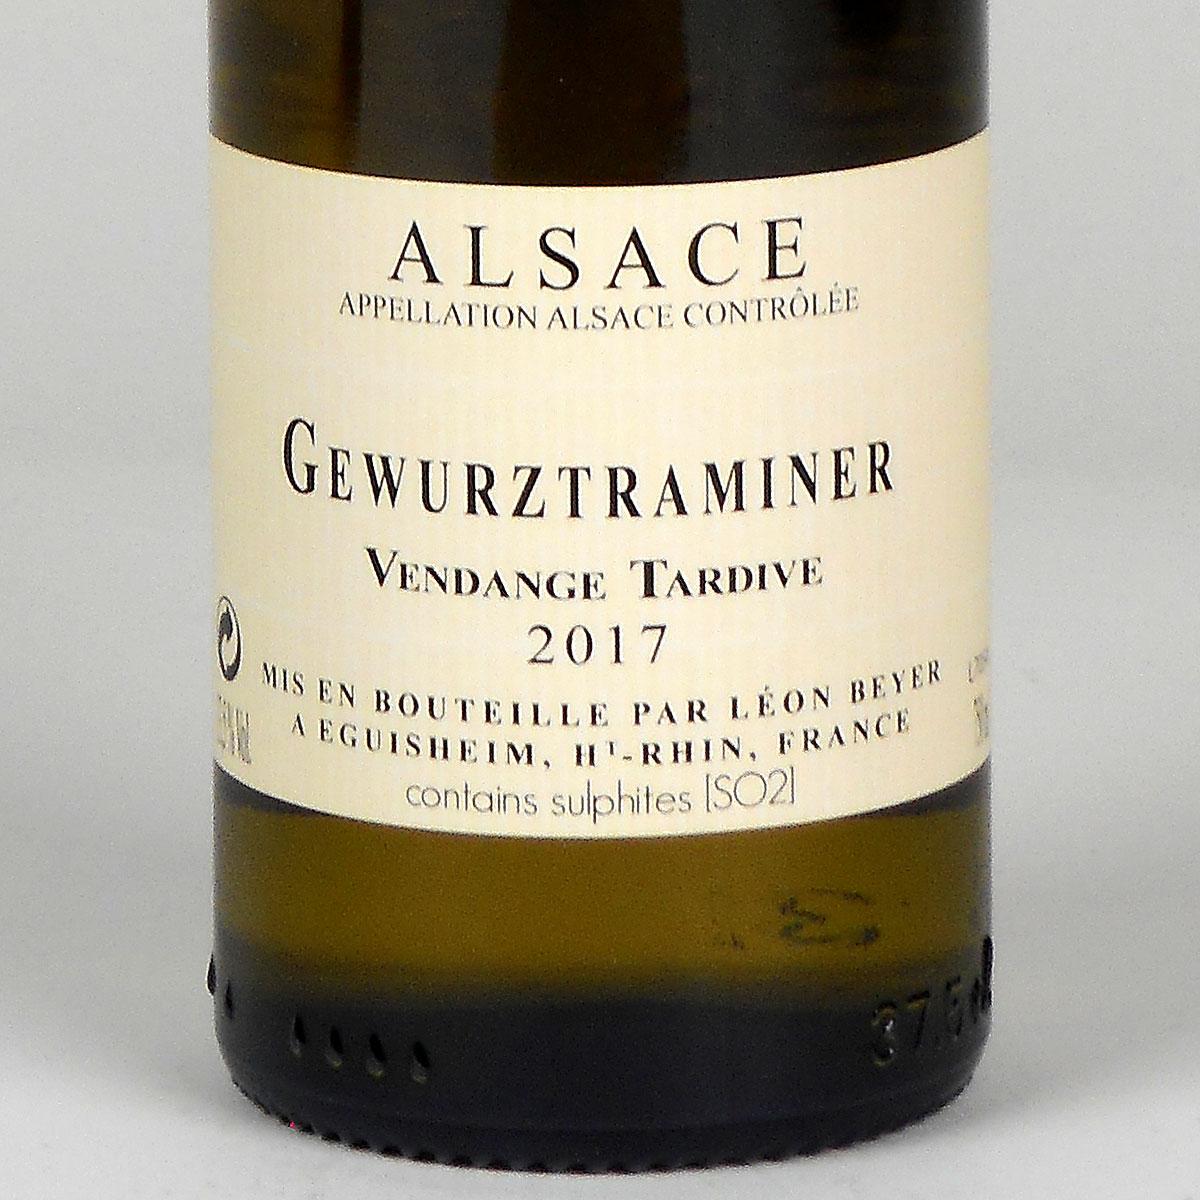 Alsace: Léon Beyer 'Vendange Tardive' Gewürztraminer 2017 - Half Bottle Rear Label